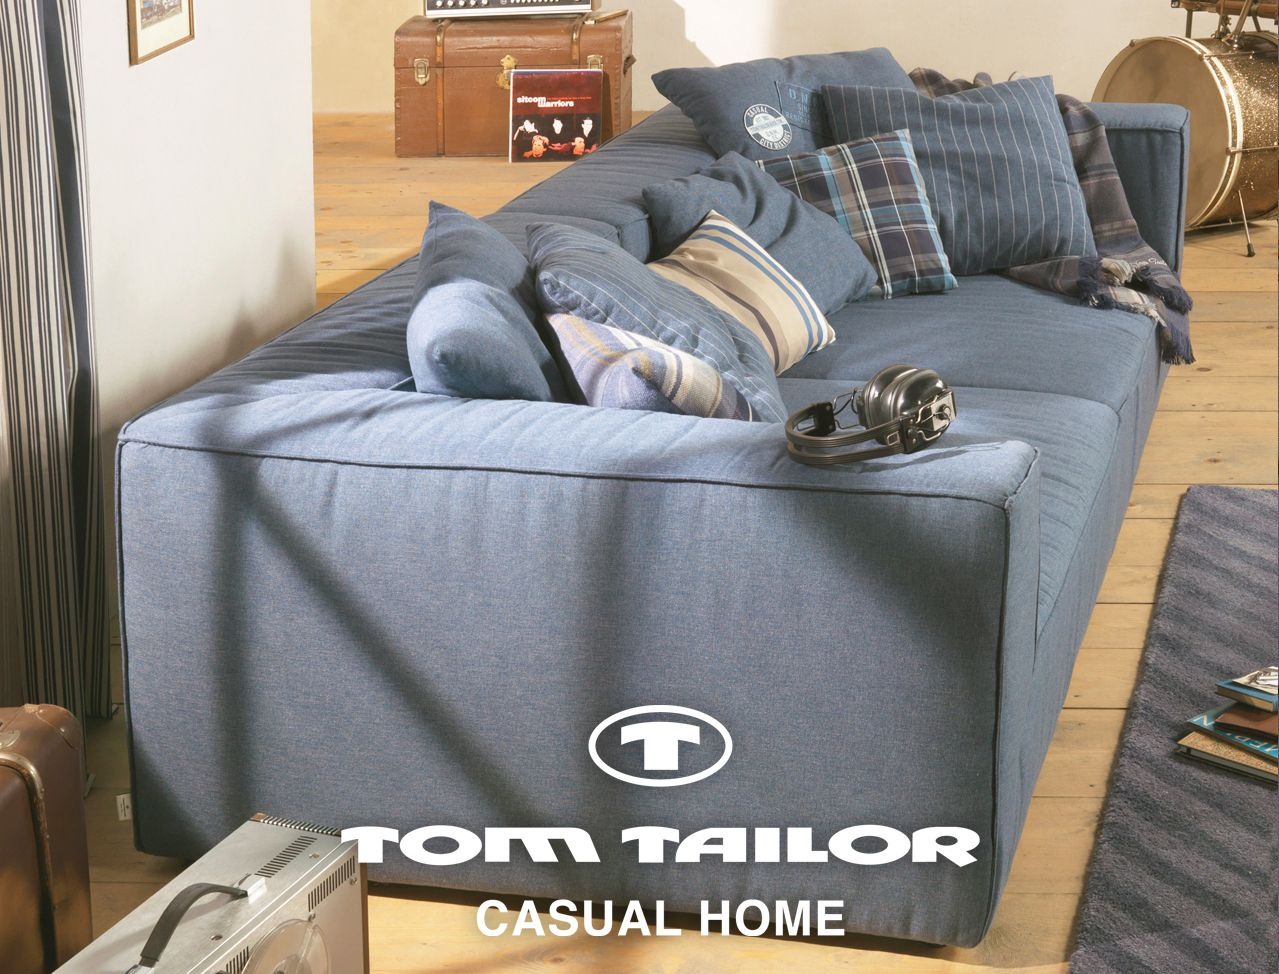 Huge Big Cube Sofa Tom Tailor Www Tom Tailor Com Decoracao